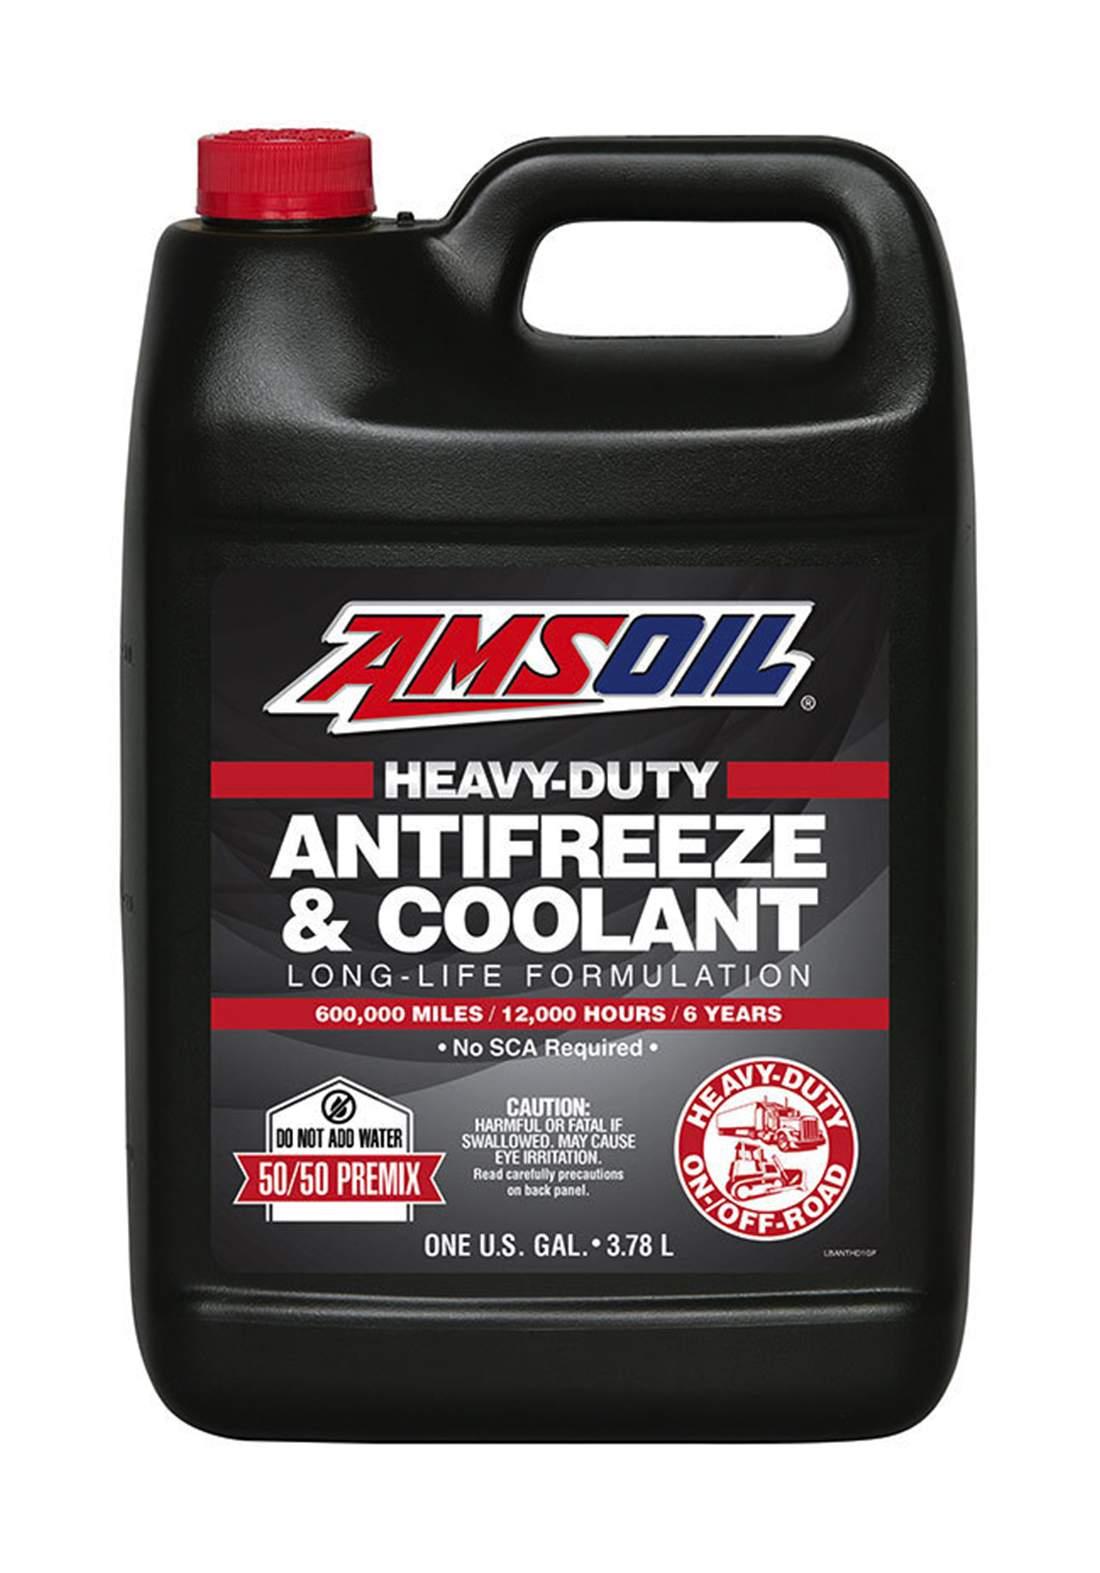 AMSOil Heavy-Duty Antifreeze & Coolant سائل تبريد السيارة